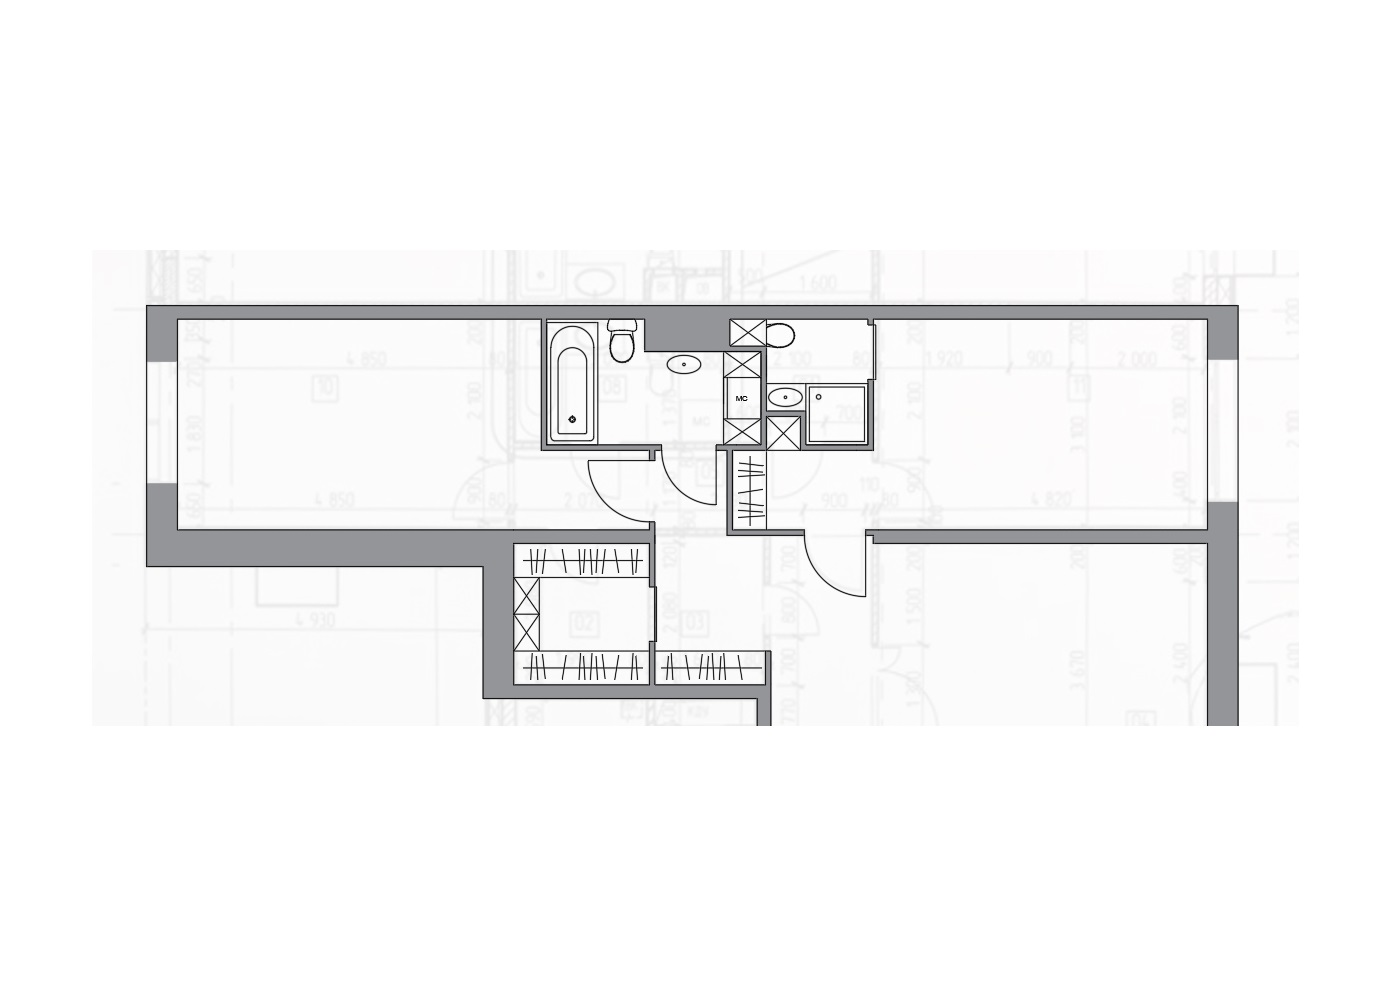 Дизайн-проект для ванных комнат фото f_8235b9ecf9c789f4.jpg